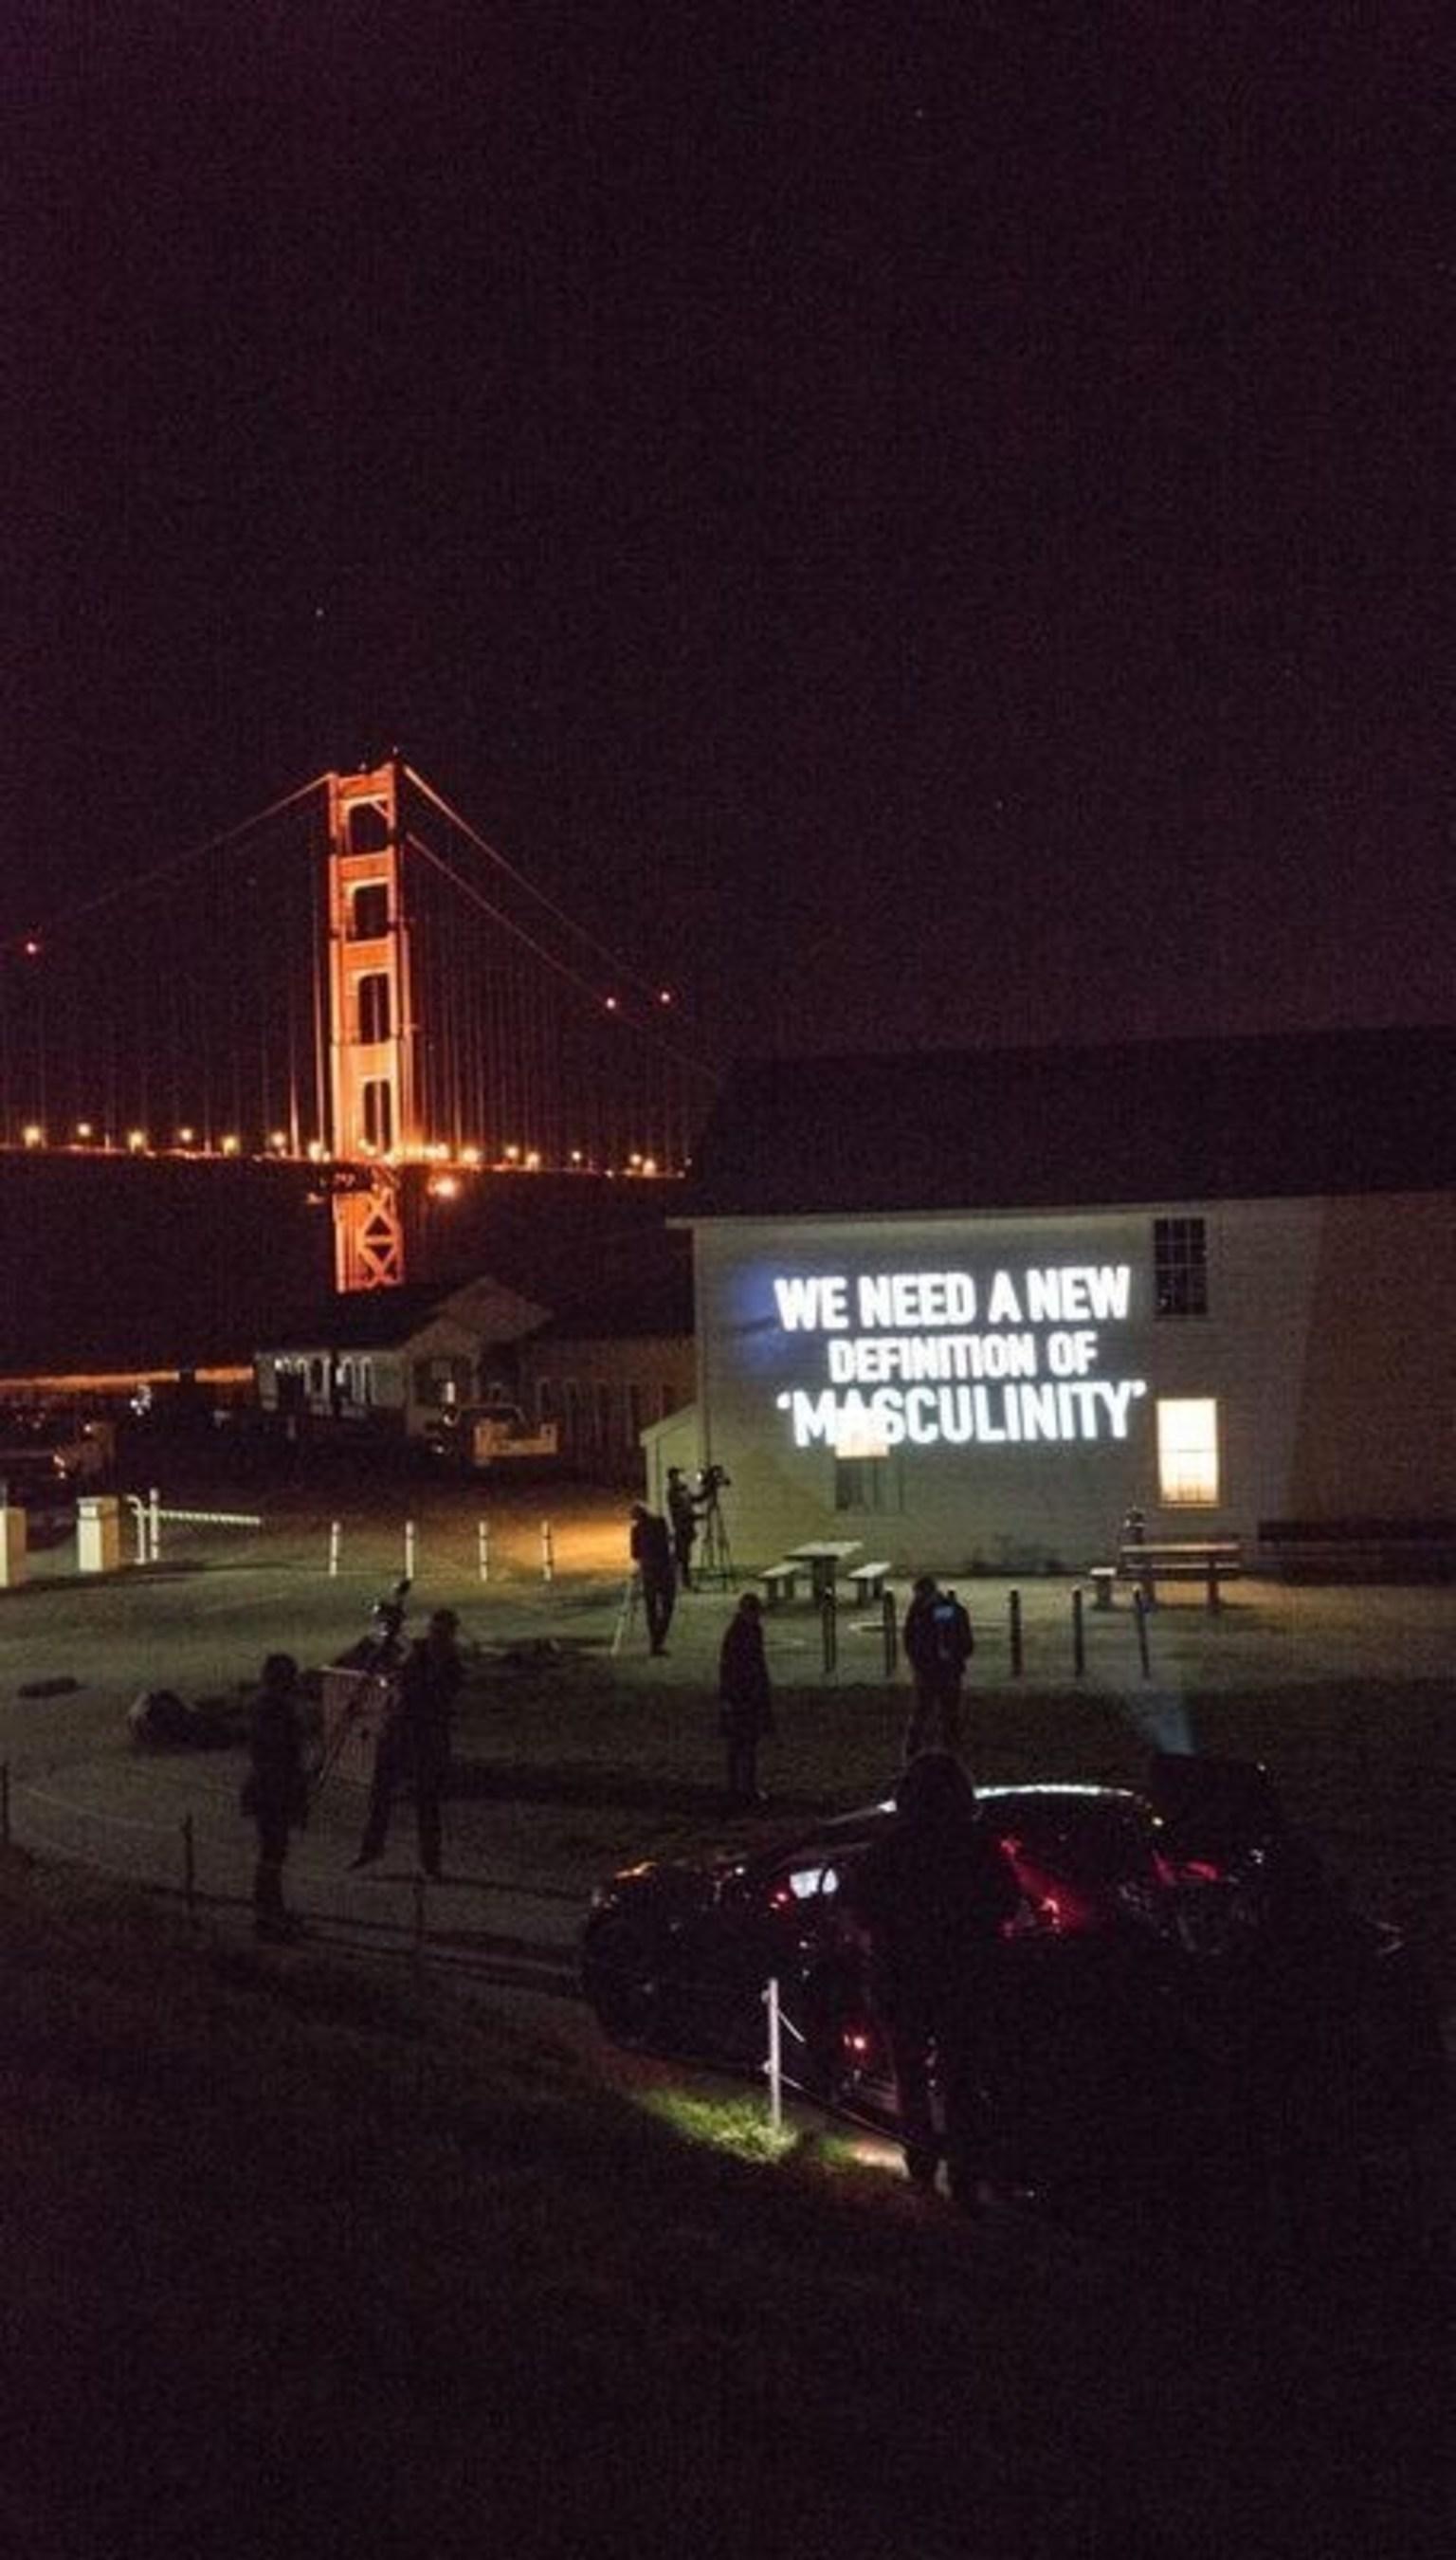 #BeAModelMan images on San Francisco landmarks (here Golden Gate Bridge) uses focus of Super Bowl week to promote anti-violence message.